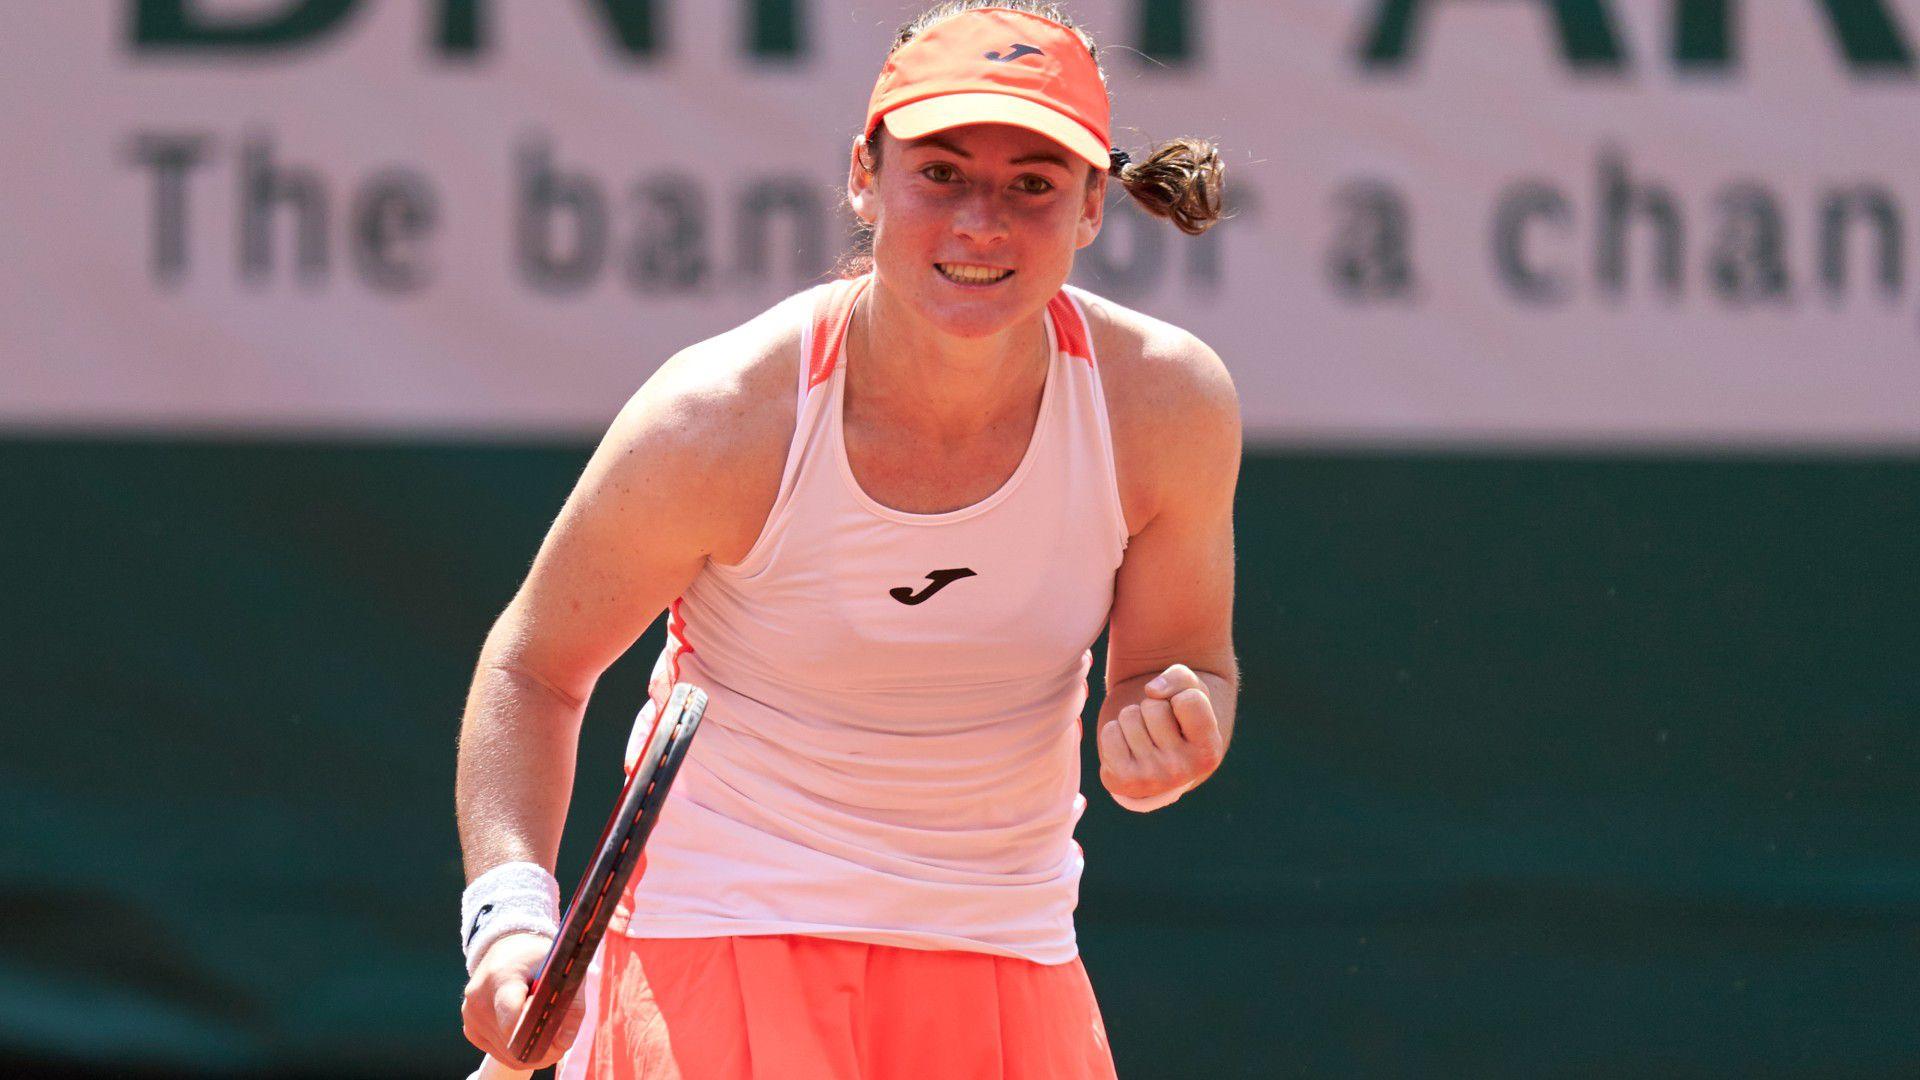 Tamara Zidansek and Anastasia Pavlyuchenkova reach semi-finals at Roland Garros